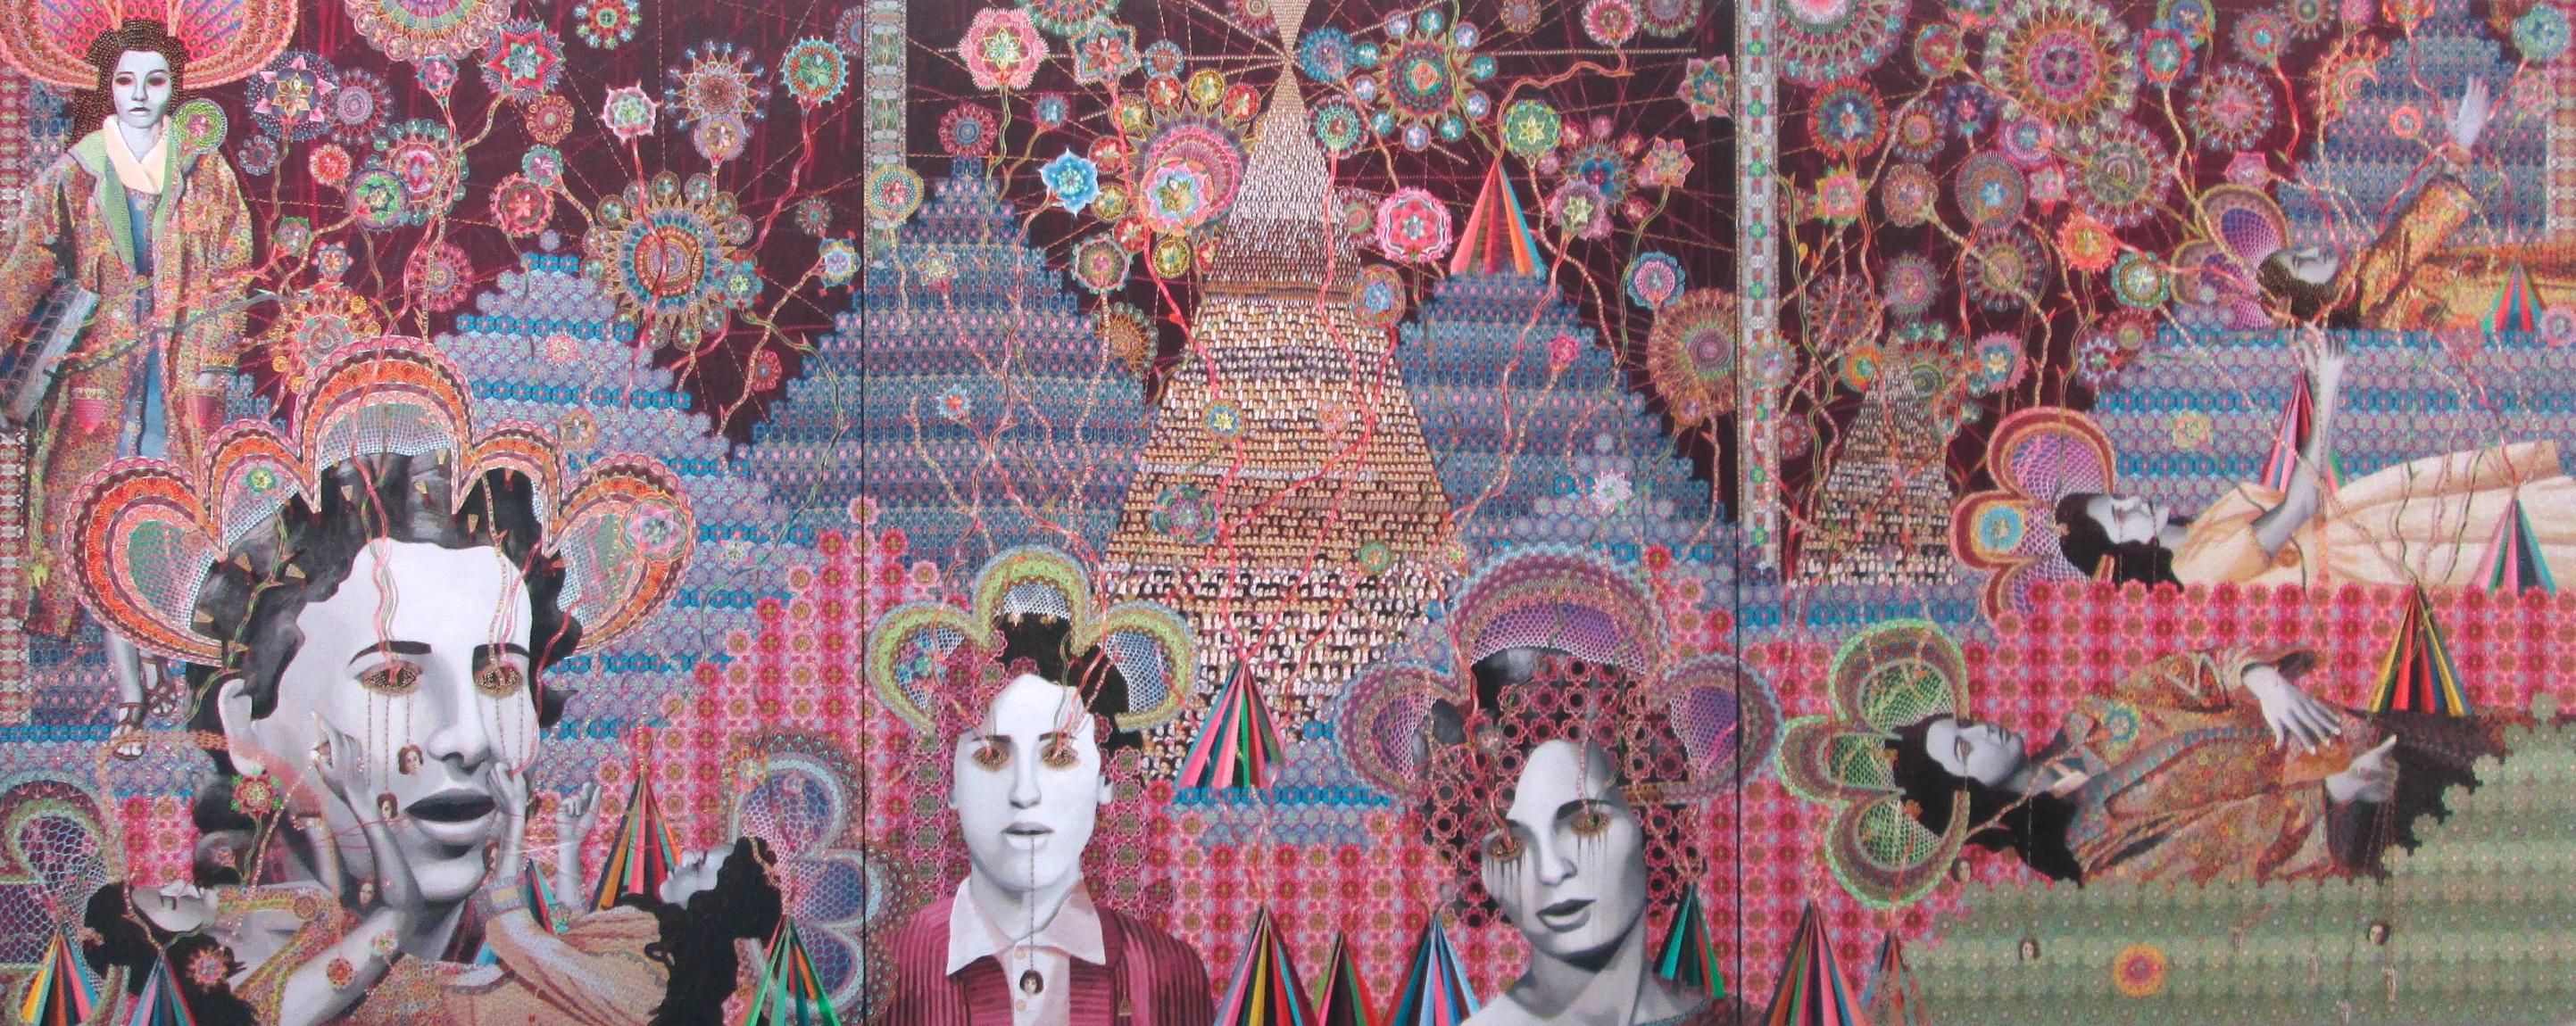 Les Femmes D'Alger #40, 2014